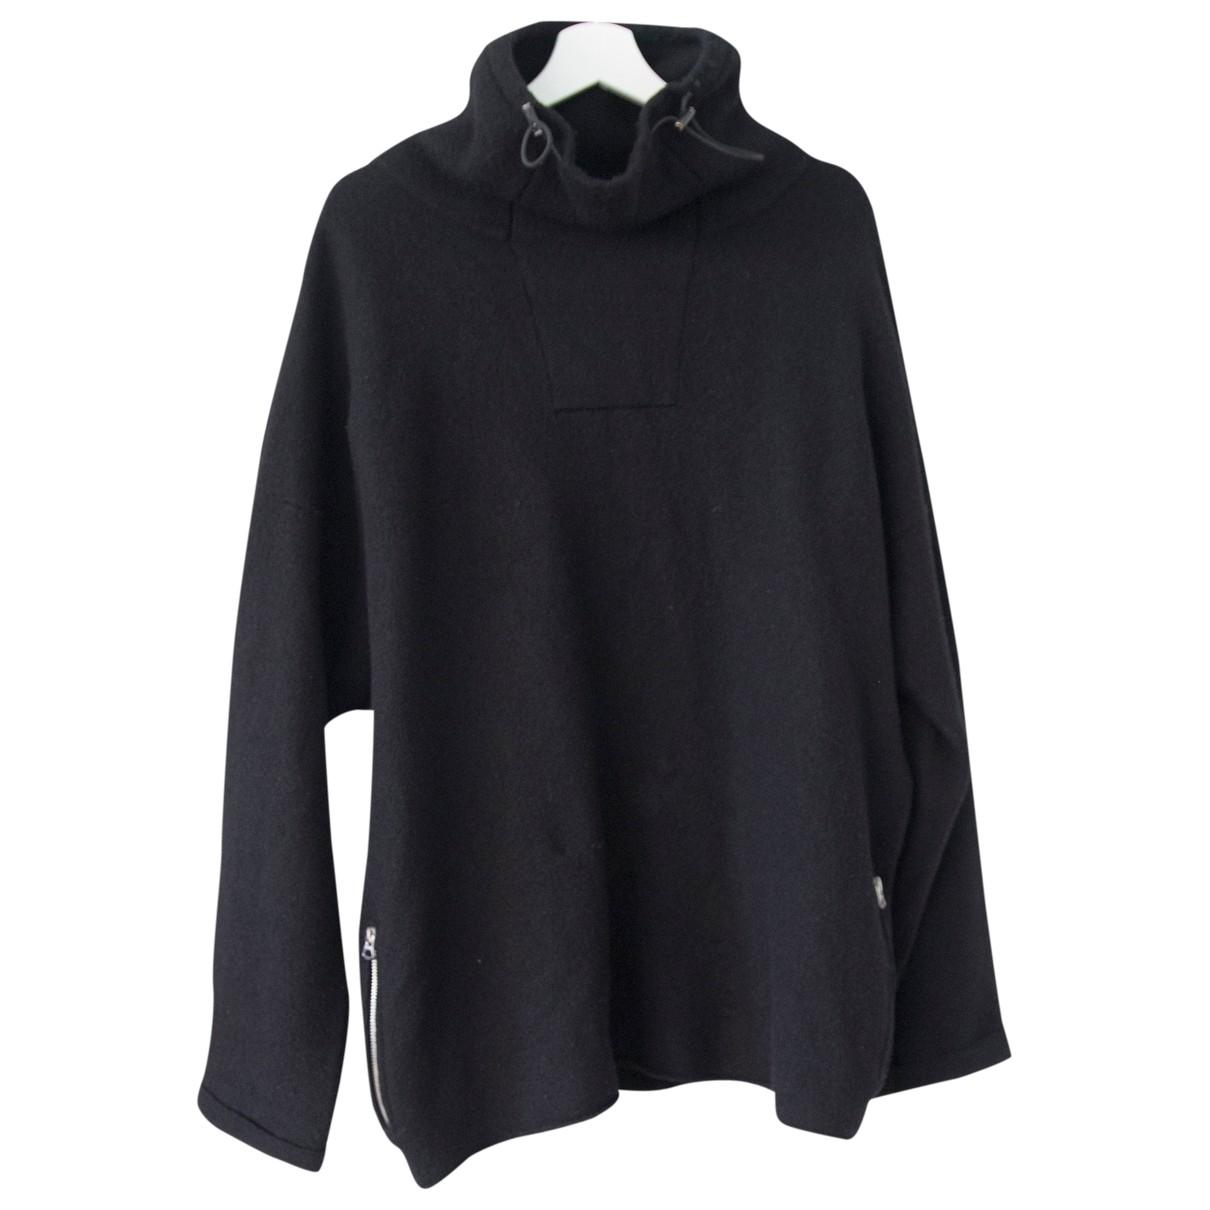 Acne Studios \N Black Wool Knitwear & Sweatshirts for Men M International